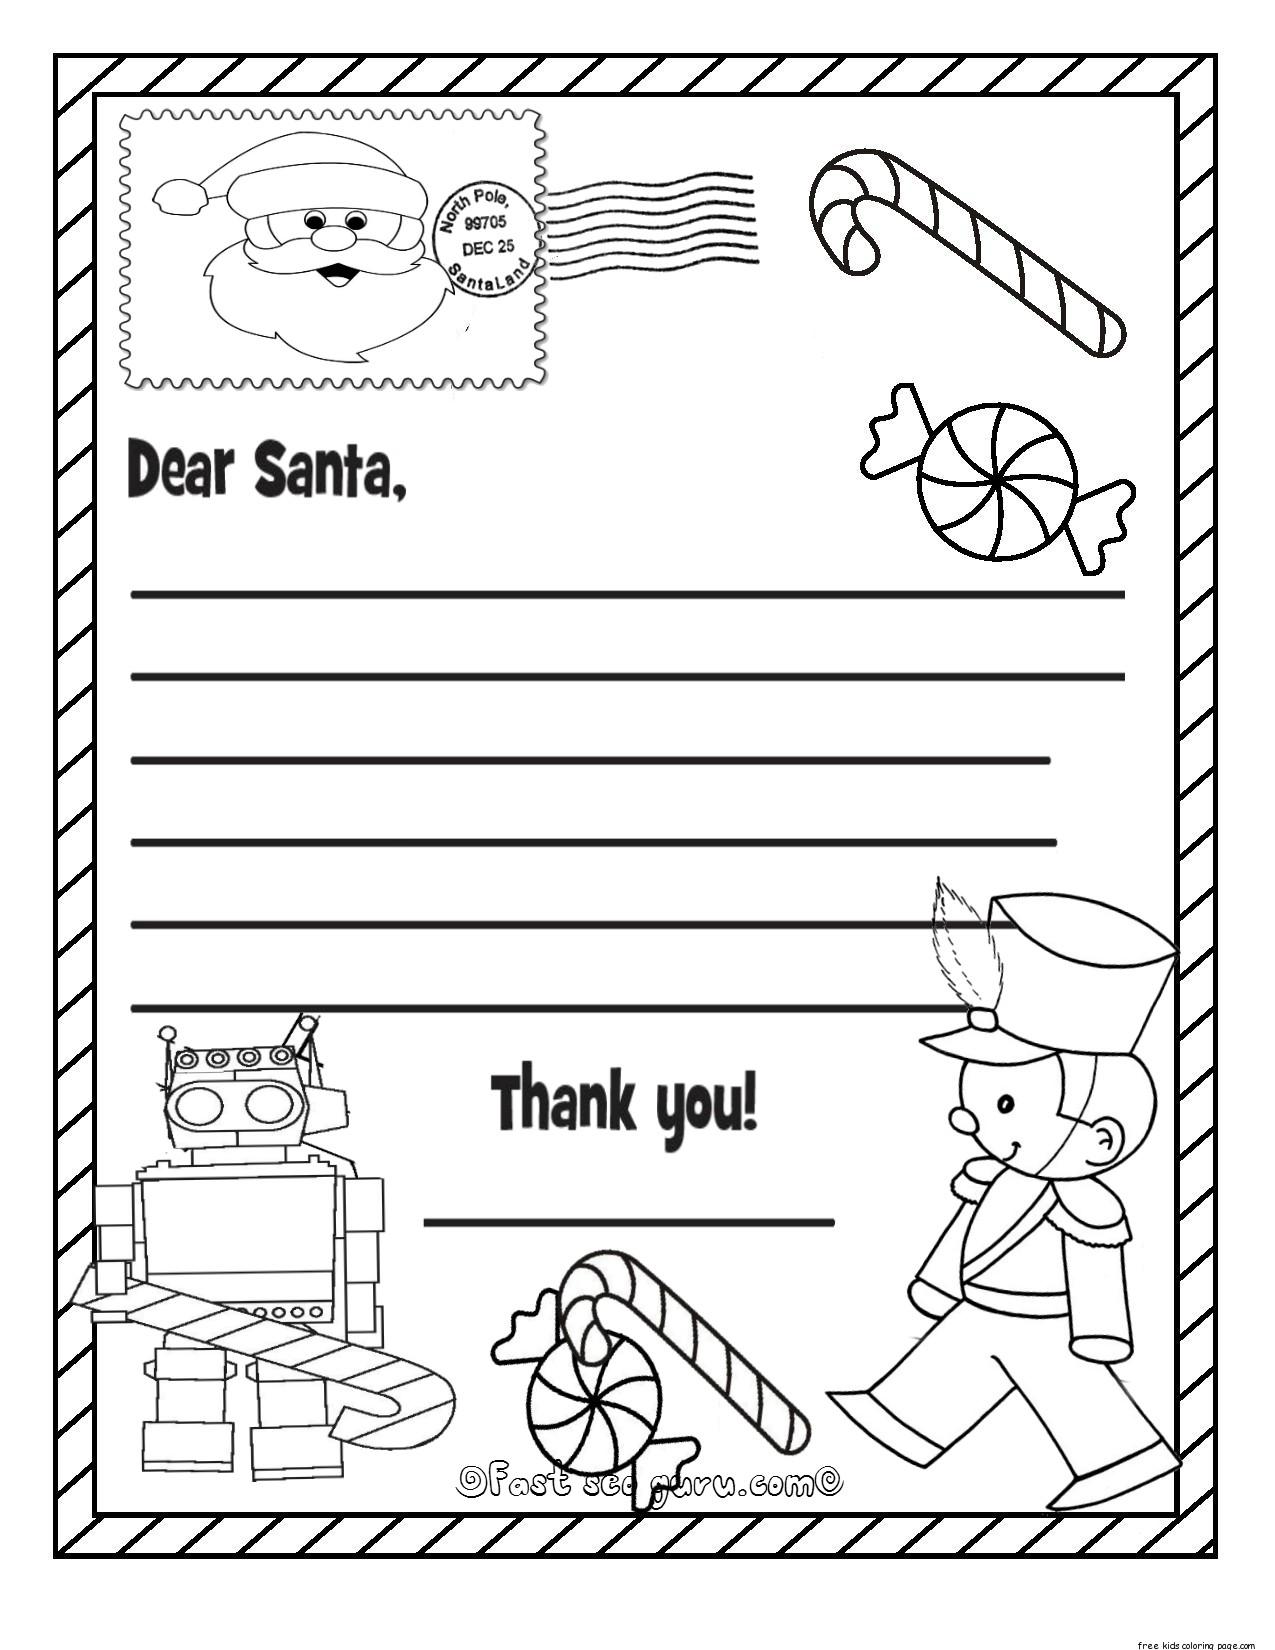 Printable Christmas Wish List To Santa Claus For Kids For